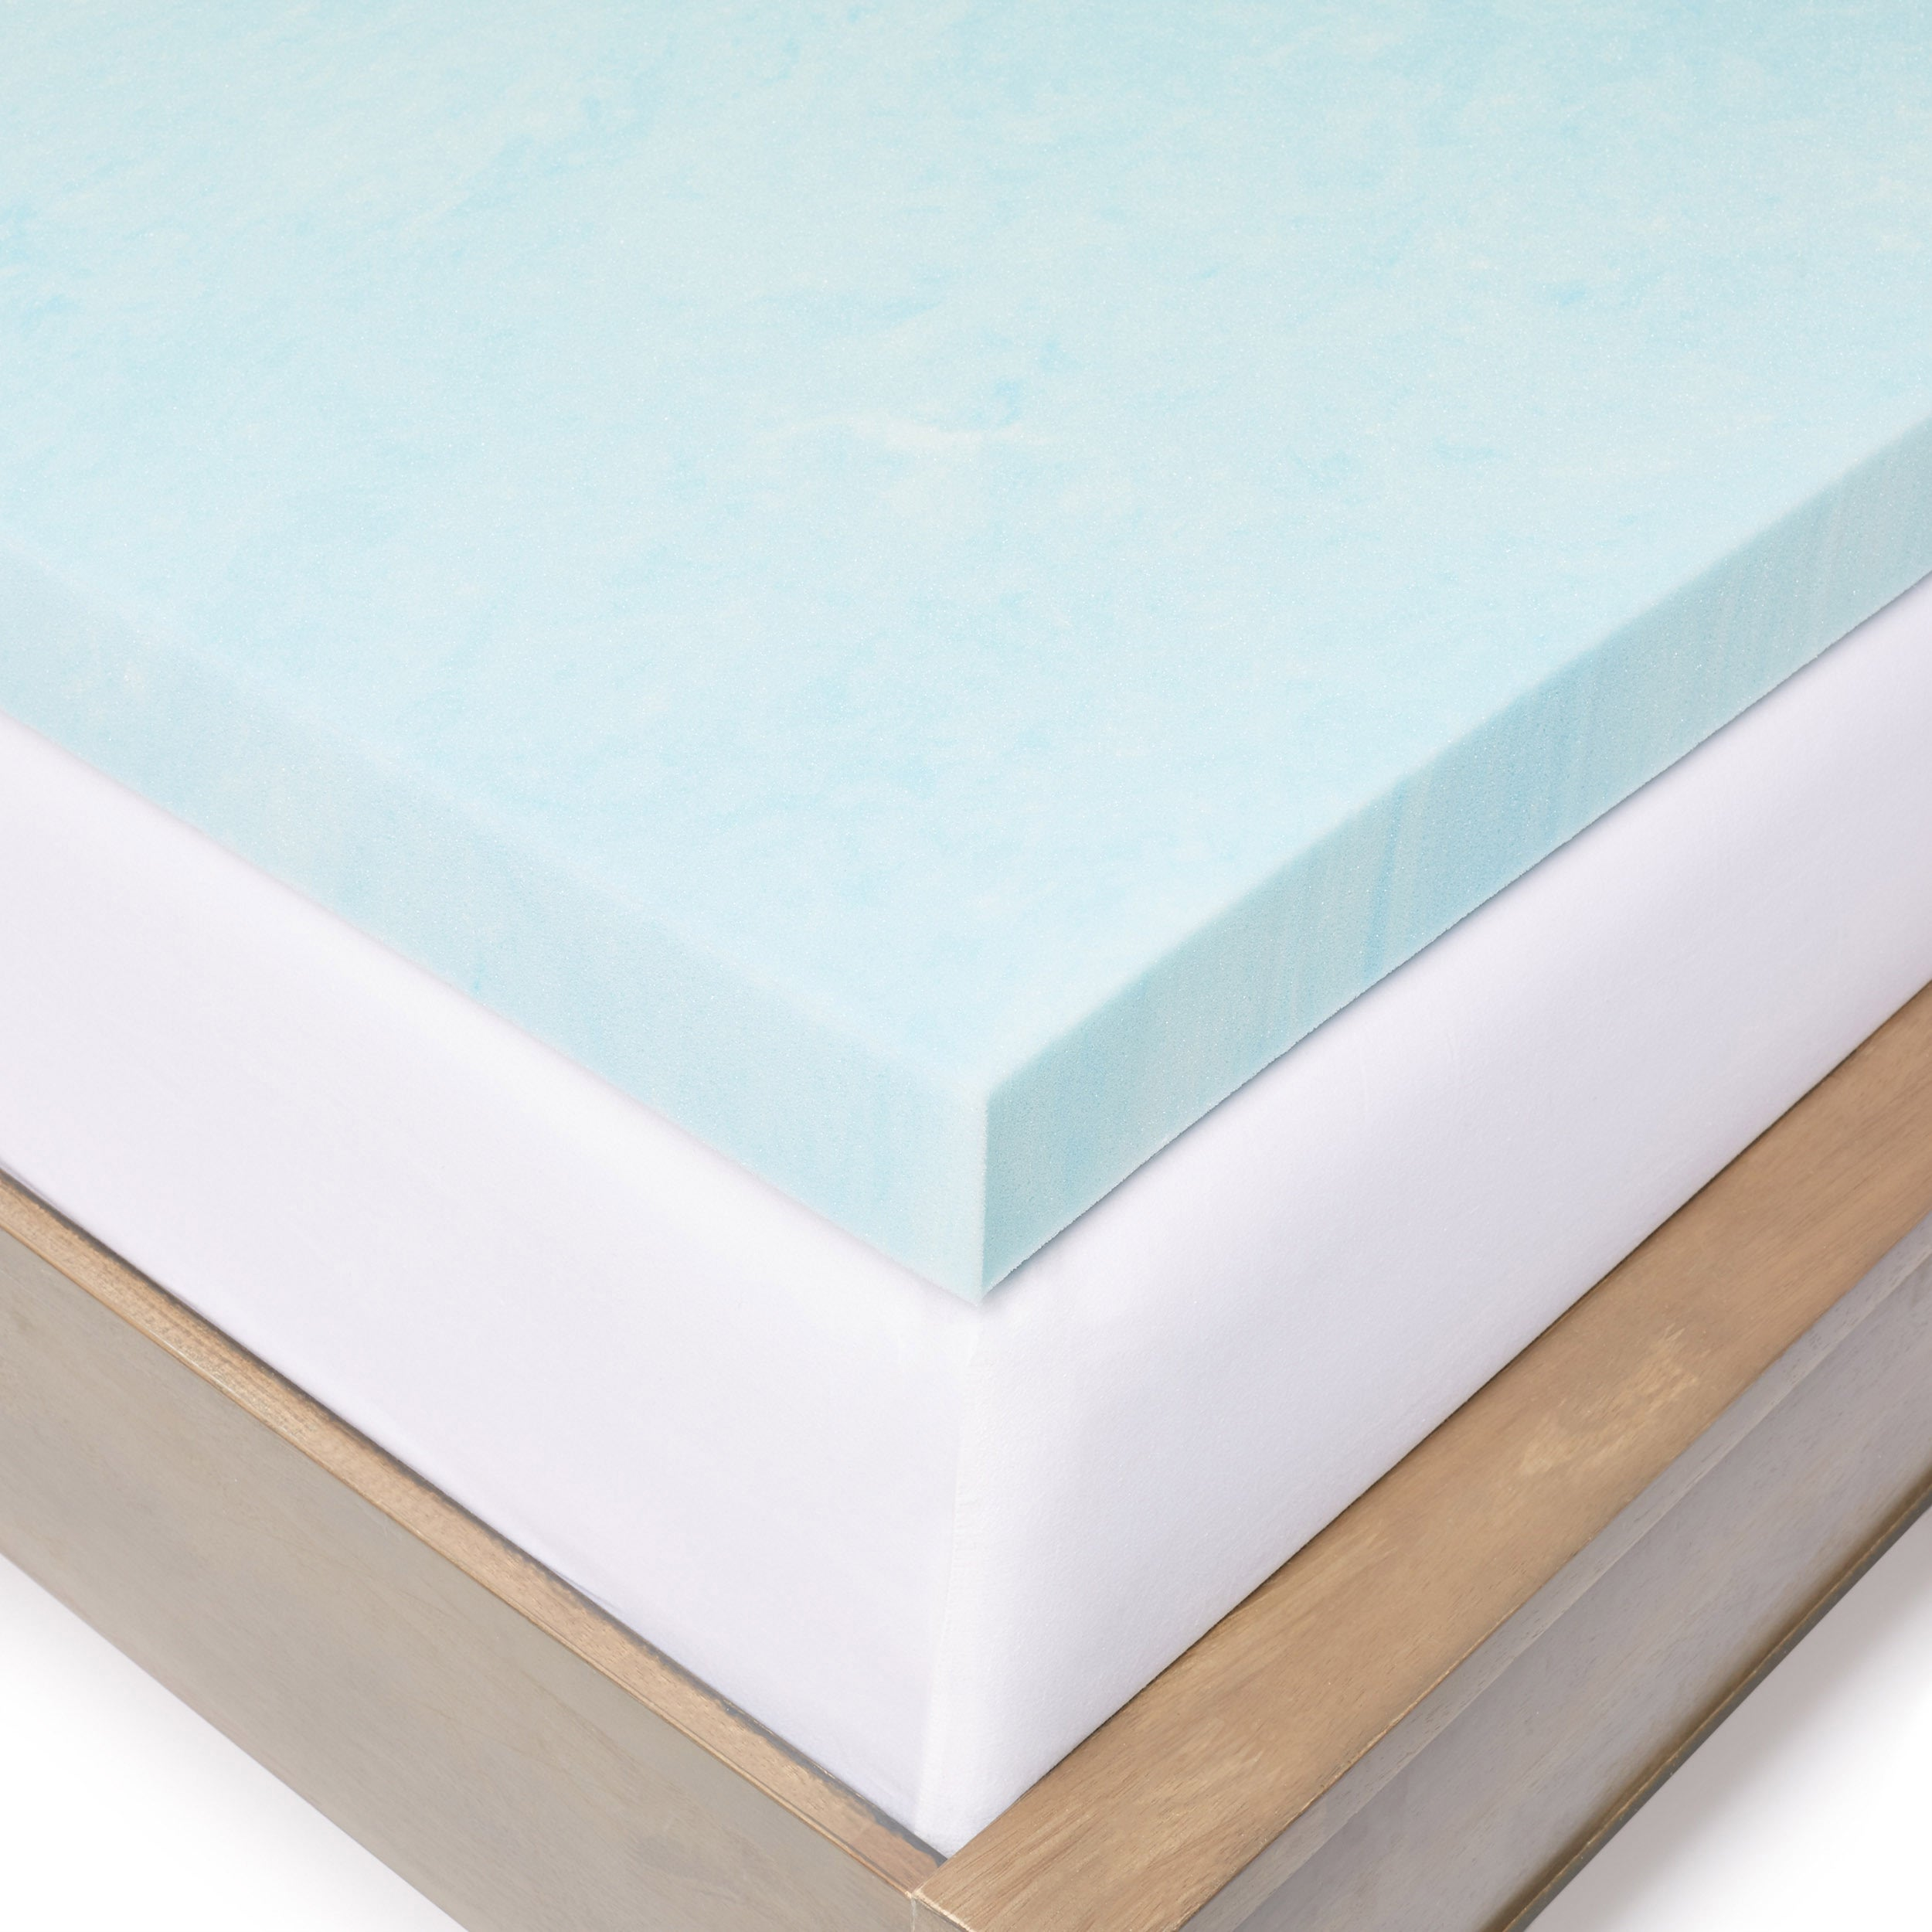 Slumber Solutions Gel Memory Foam 3 inch Mattress Topper with